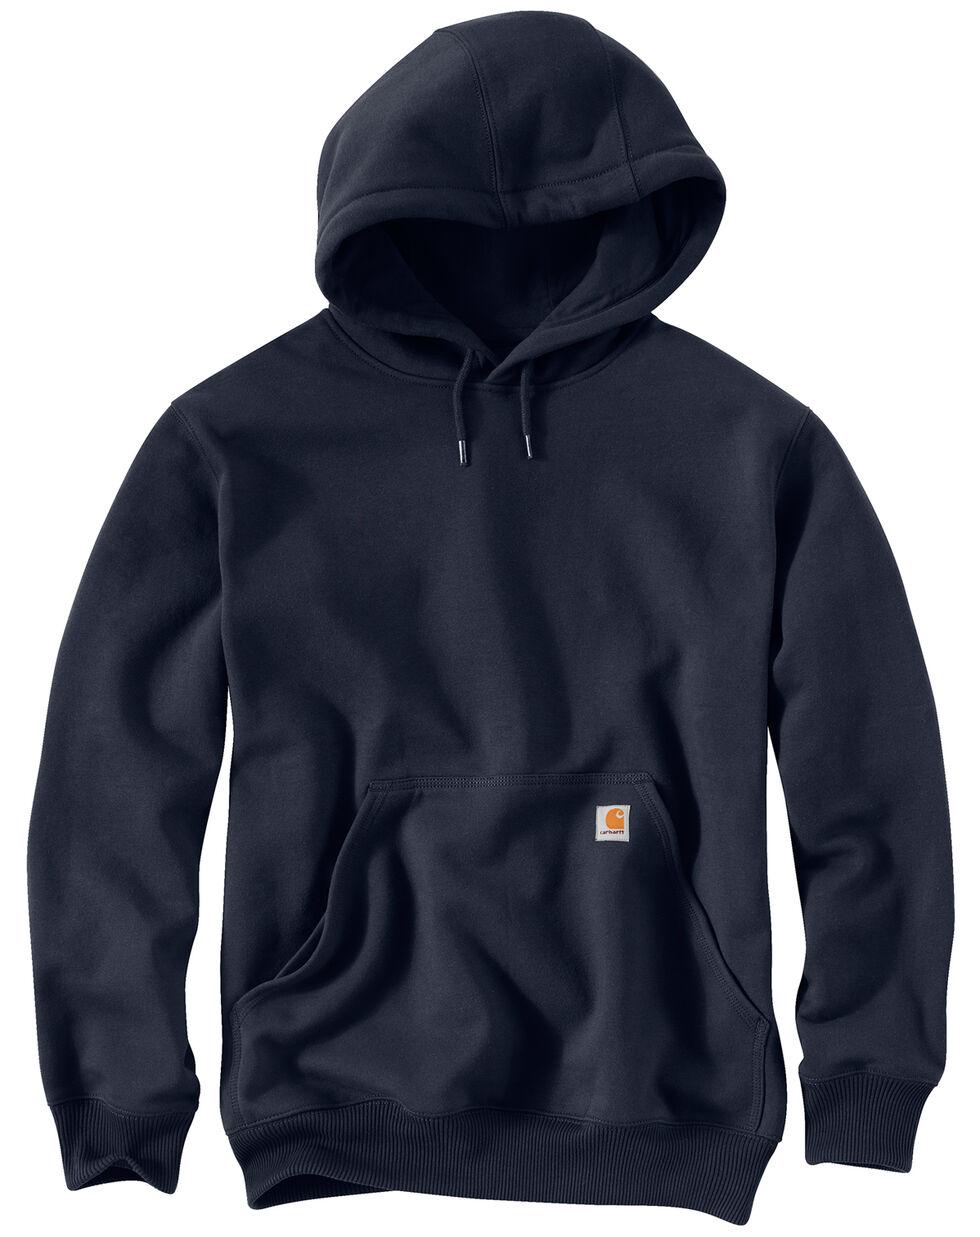 Carhartt Rain Defender Paxton Heavyweight Hooded Sweatshirt, Navy, hi-res